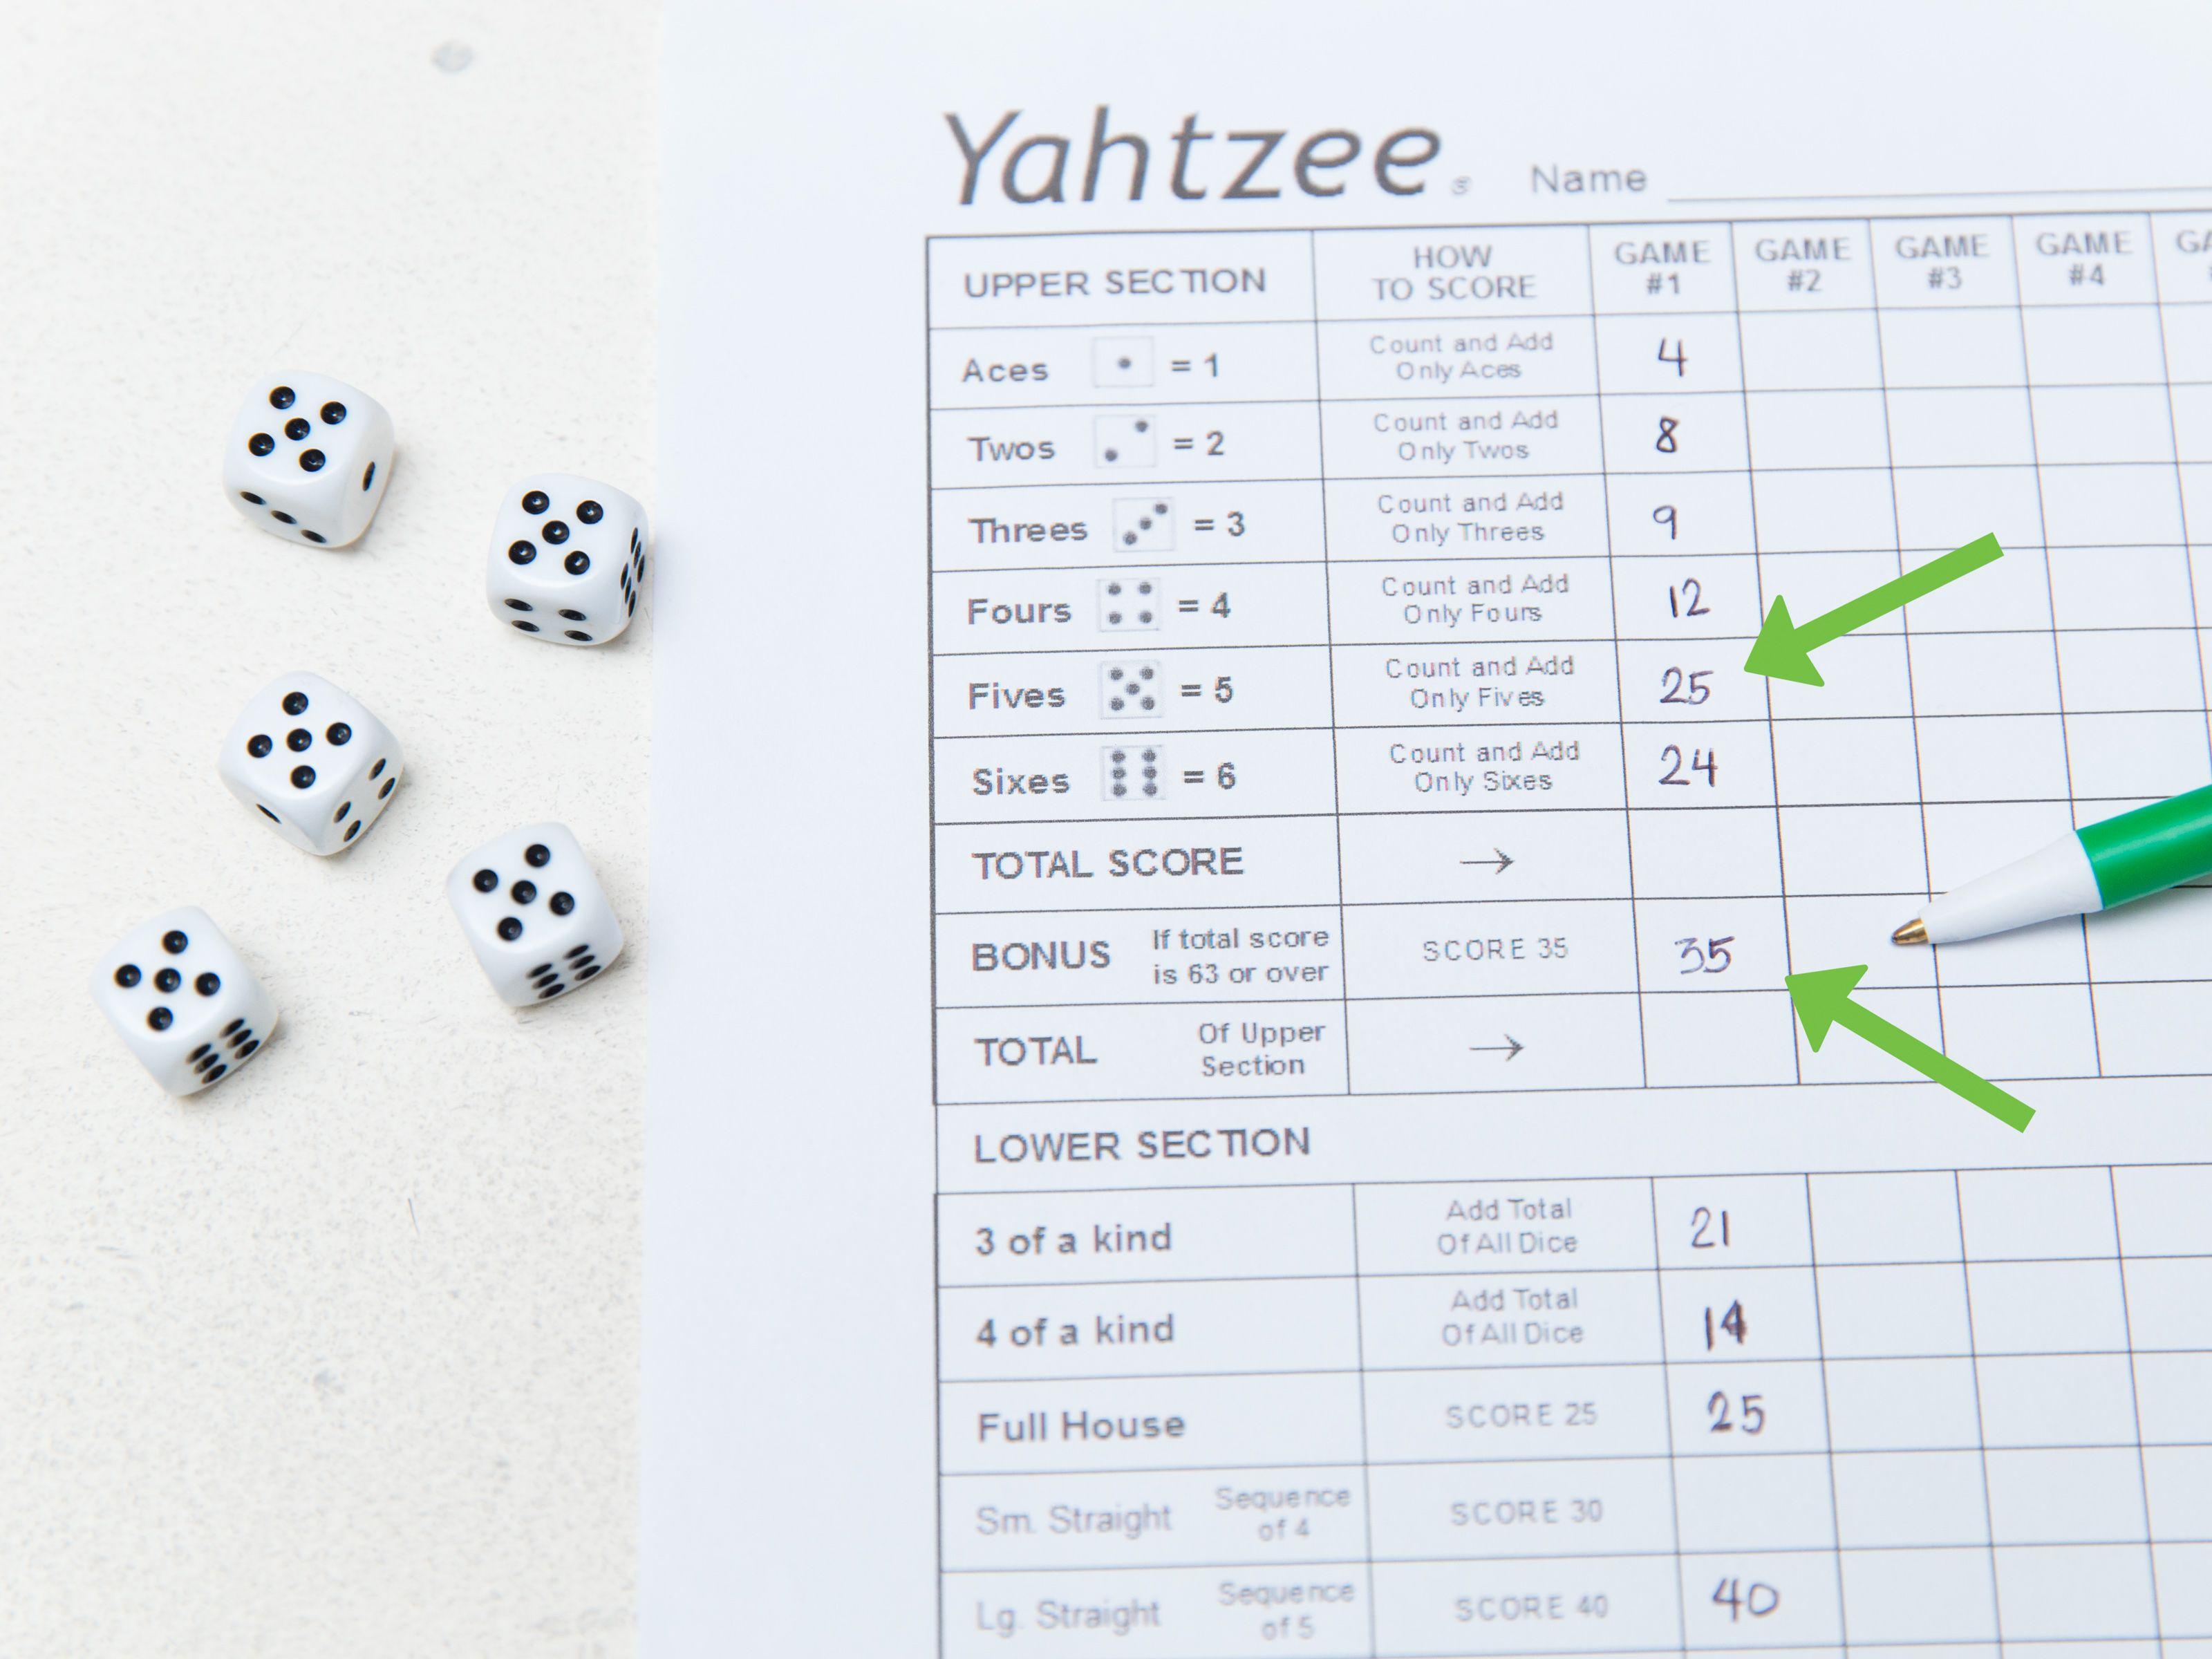 Play Yahtzee Yahtzee, Casino bonus, Casino